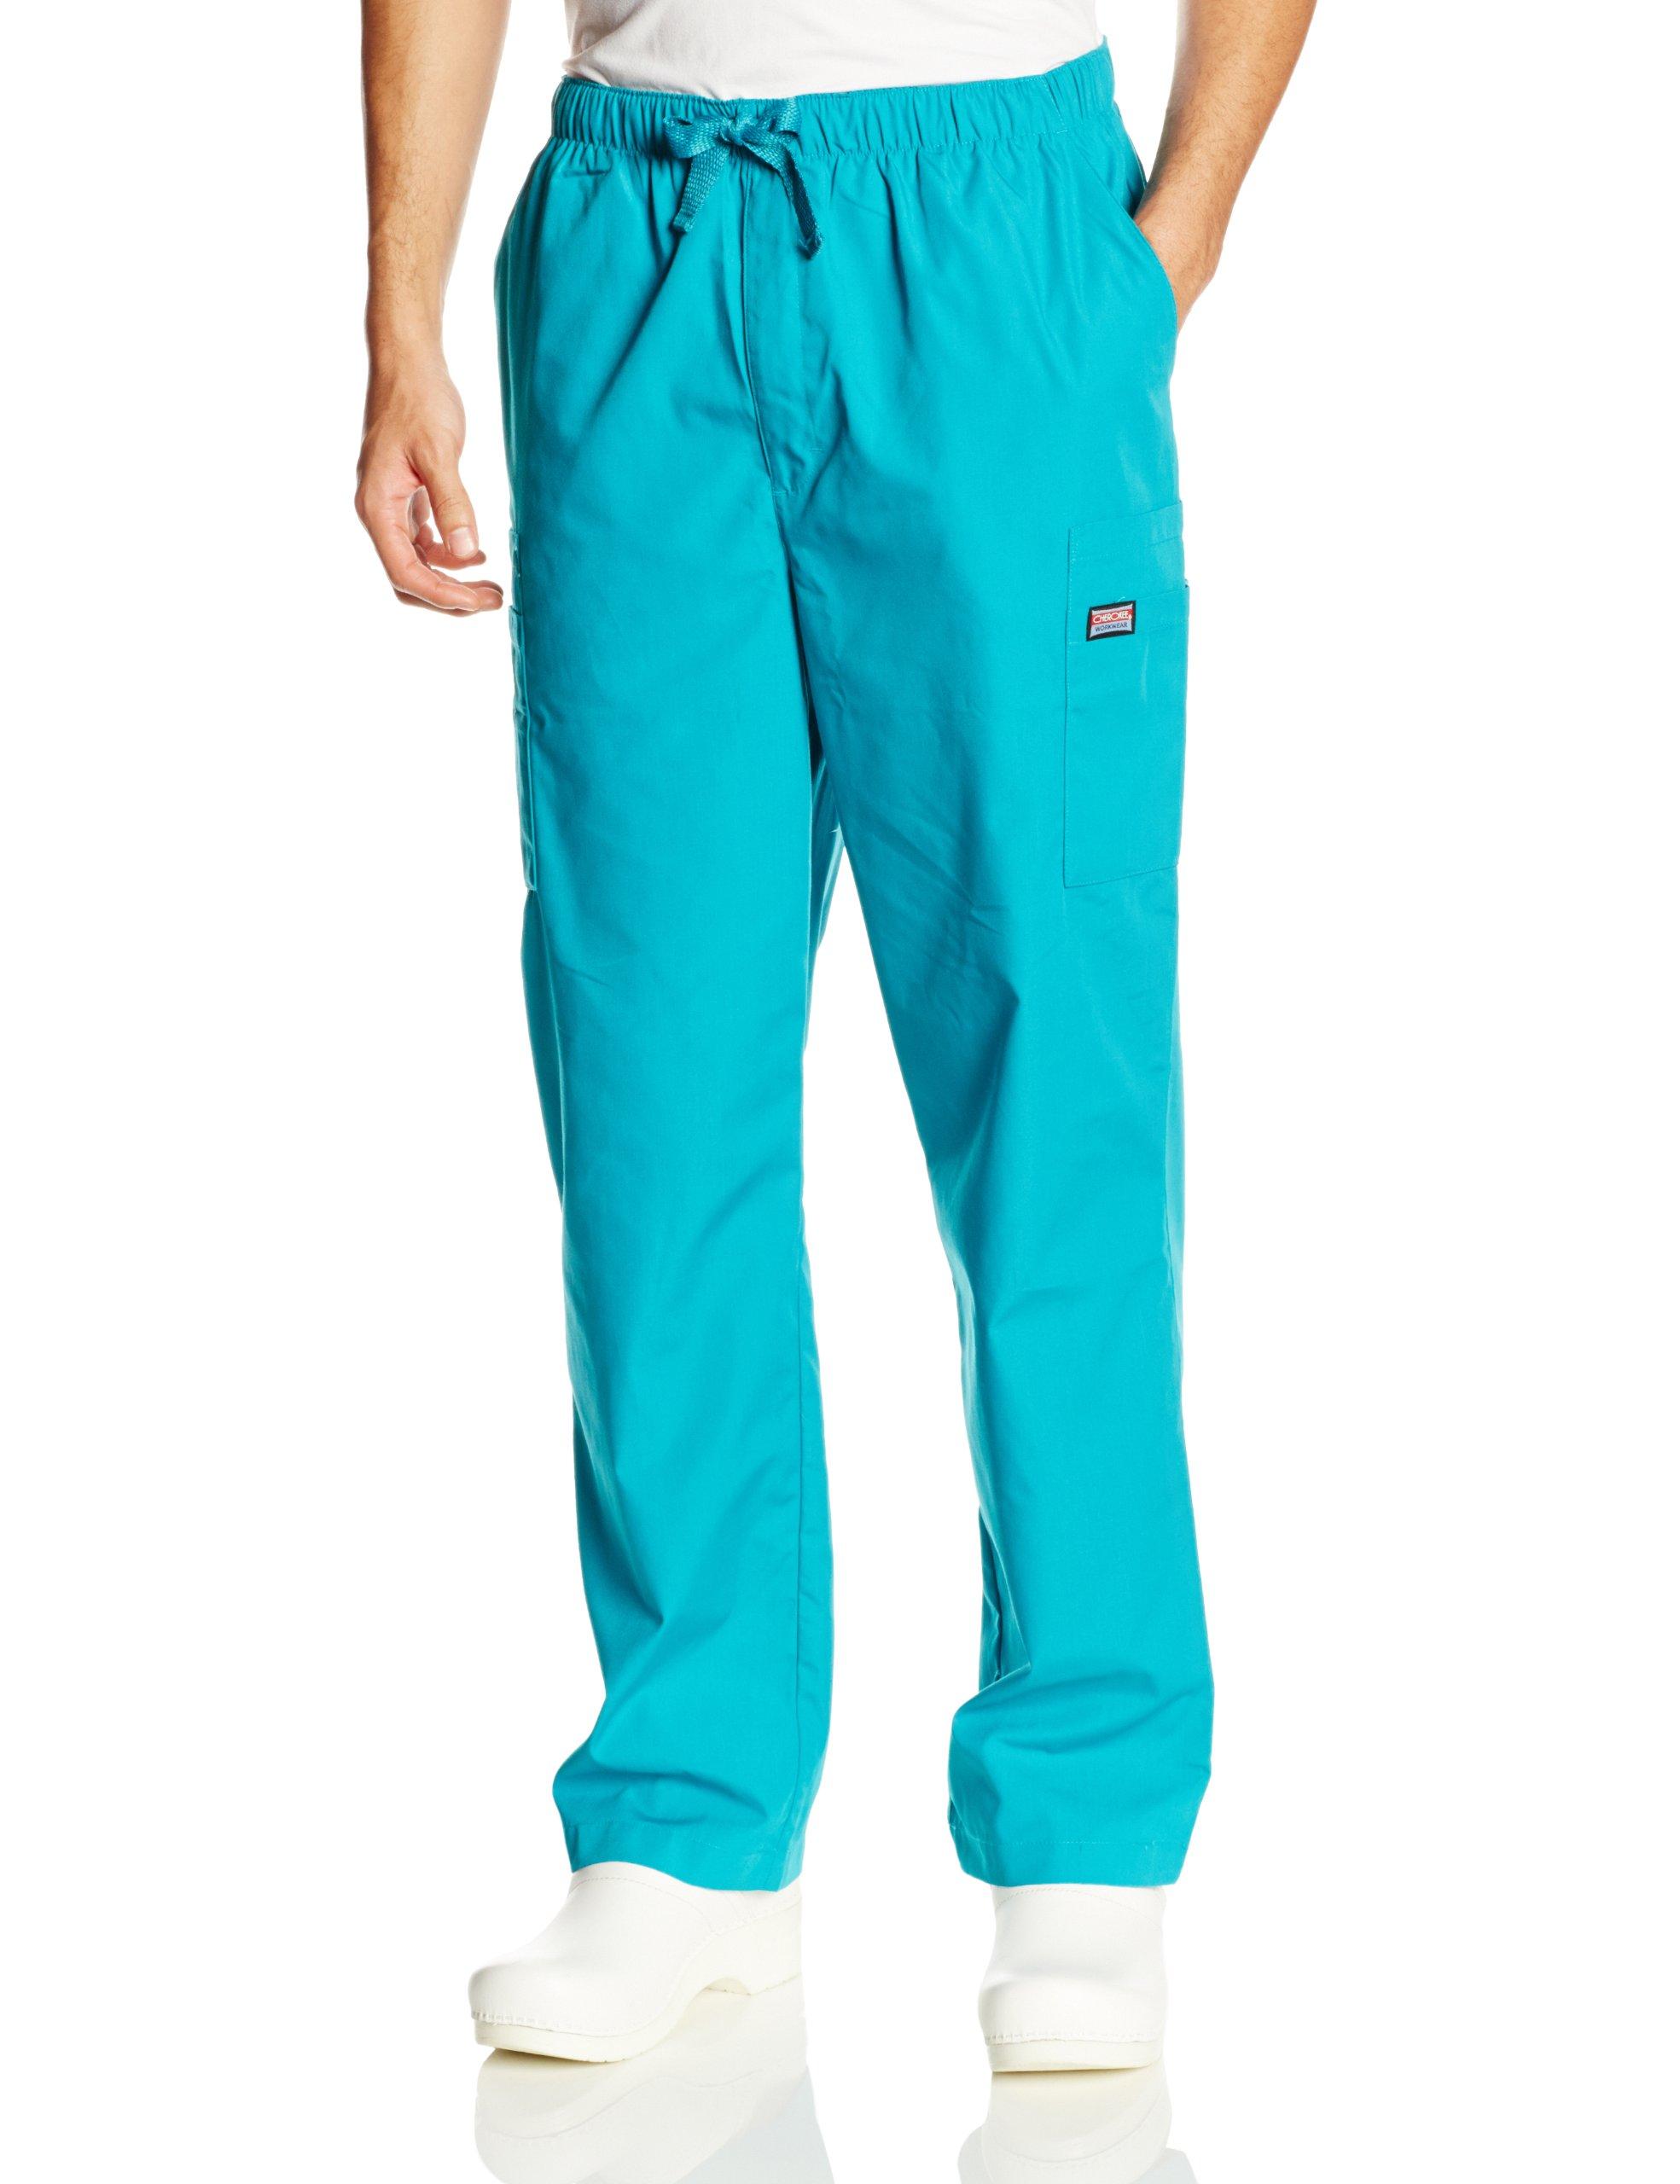 Teal Pants Amazon Com